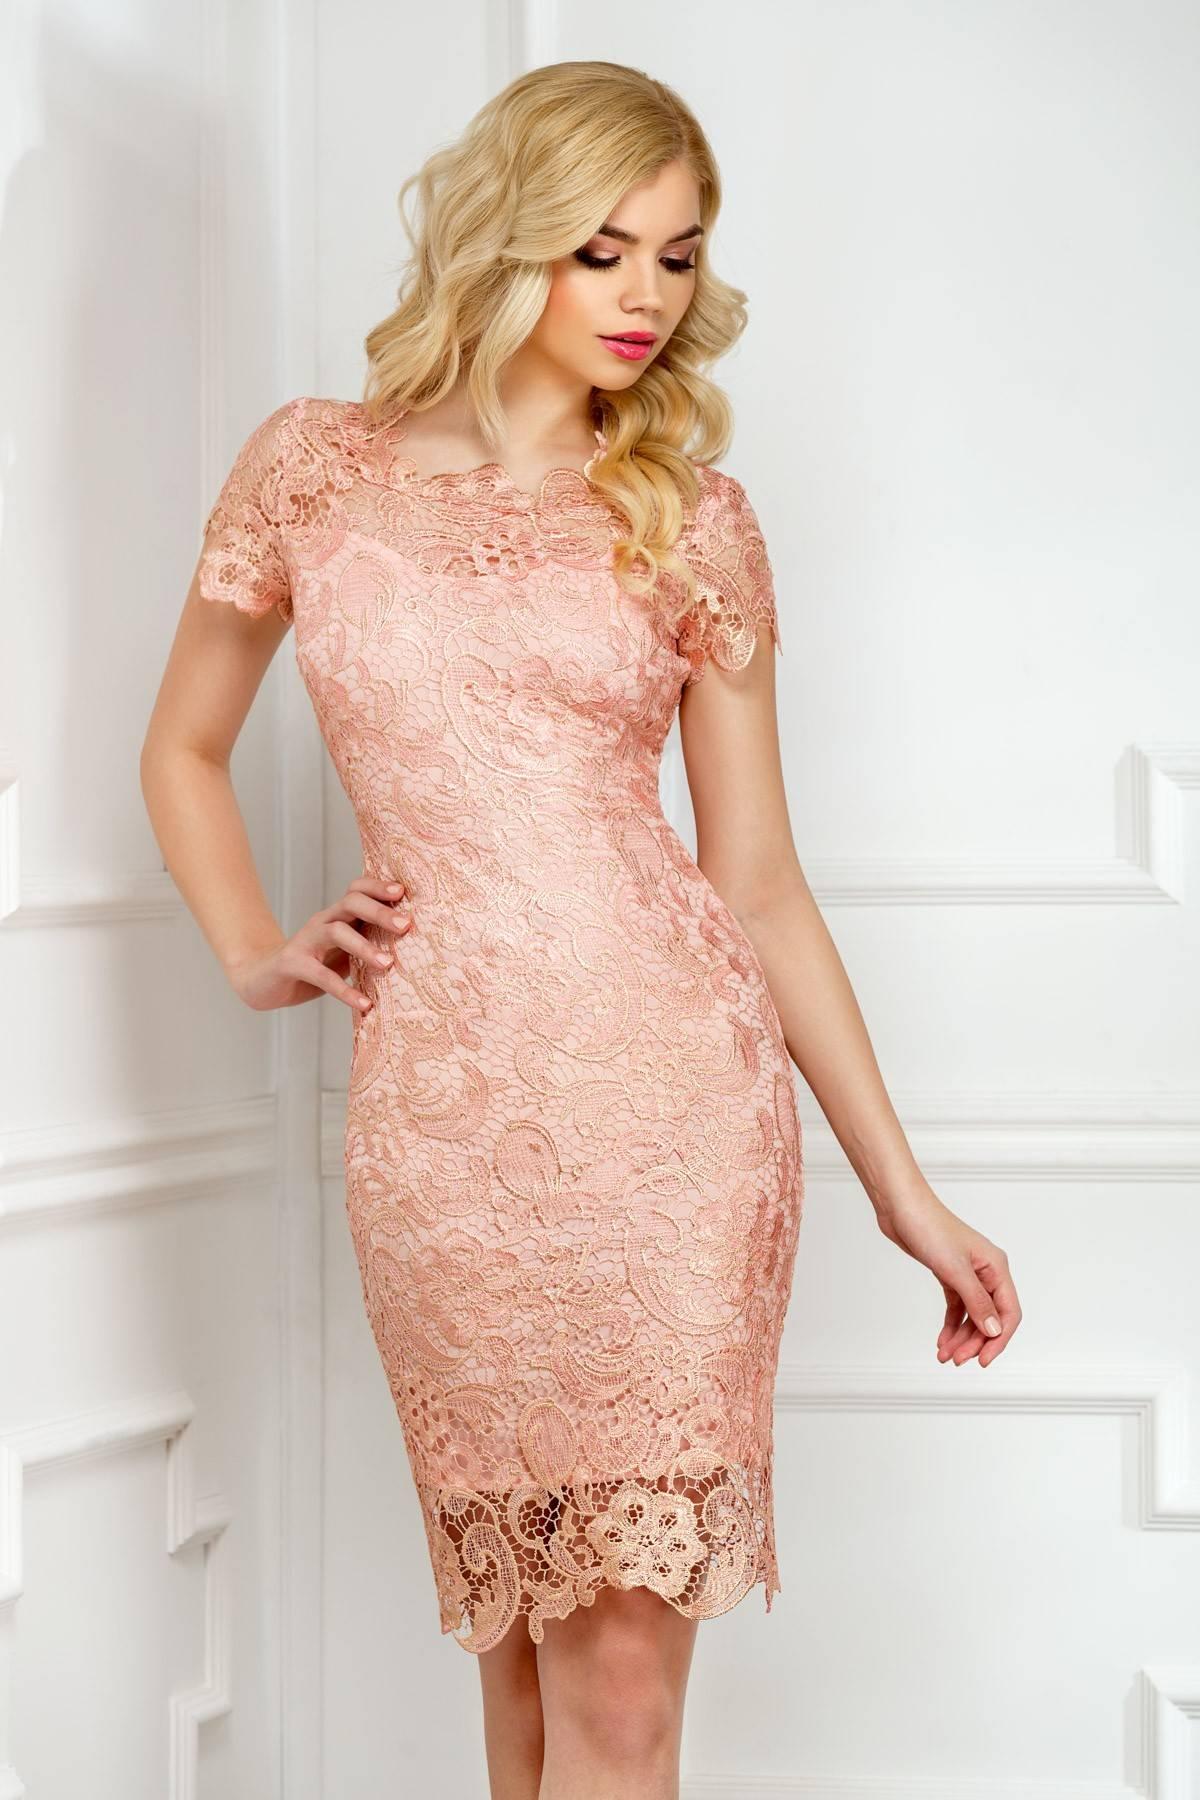 elegant dress lace - photo #22